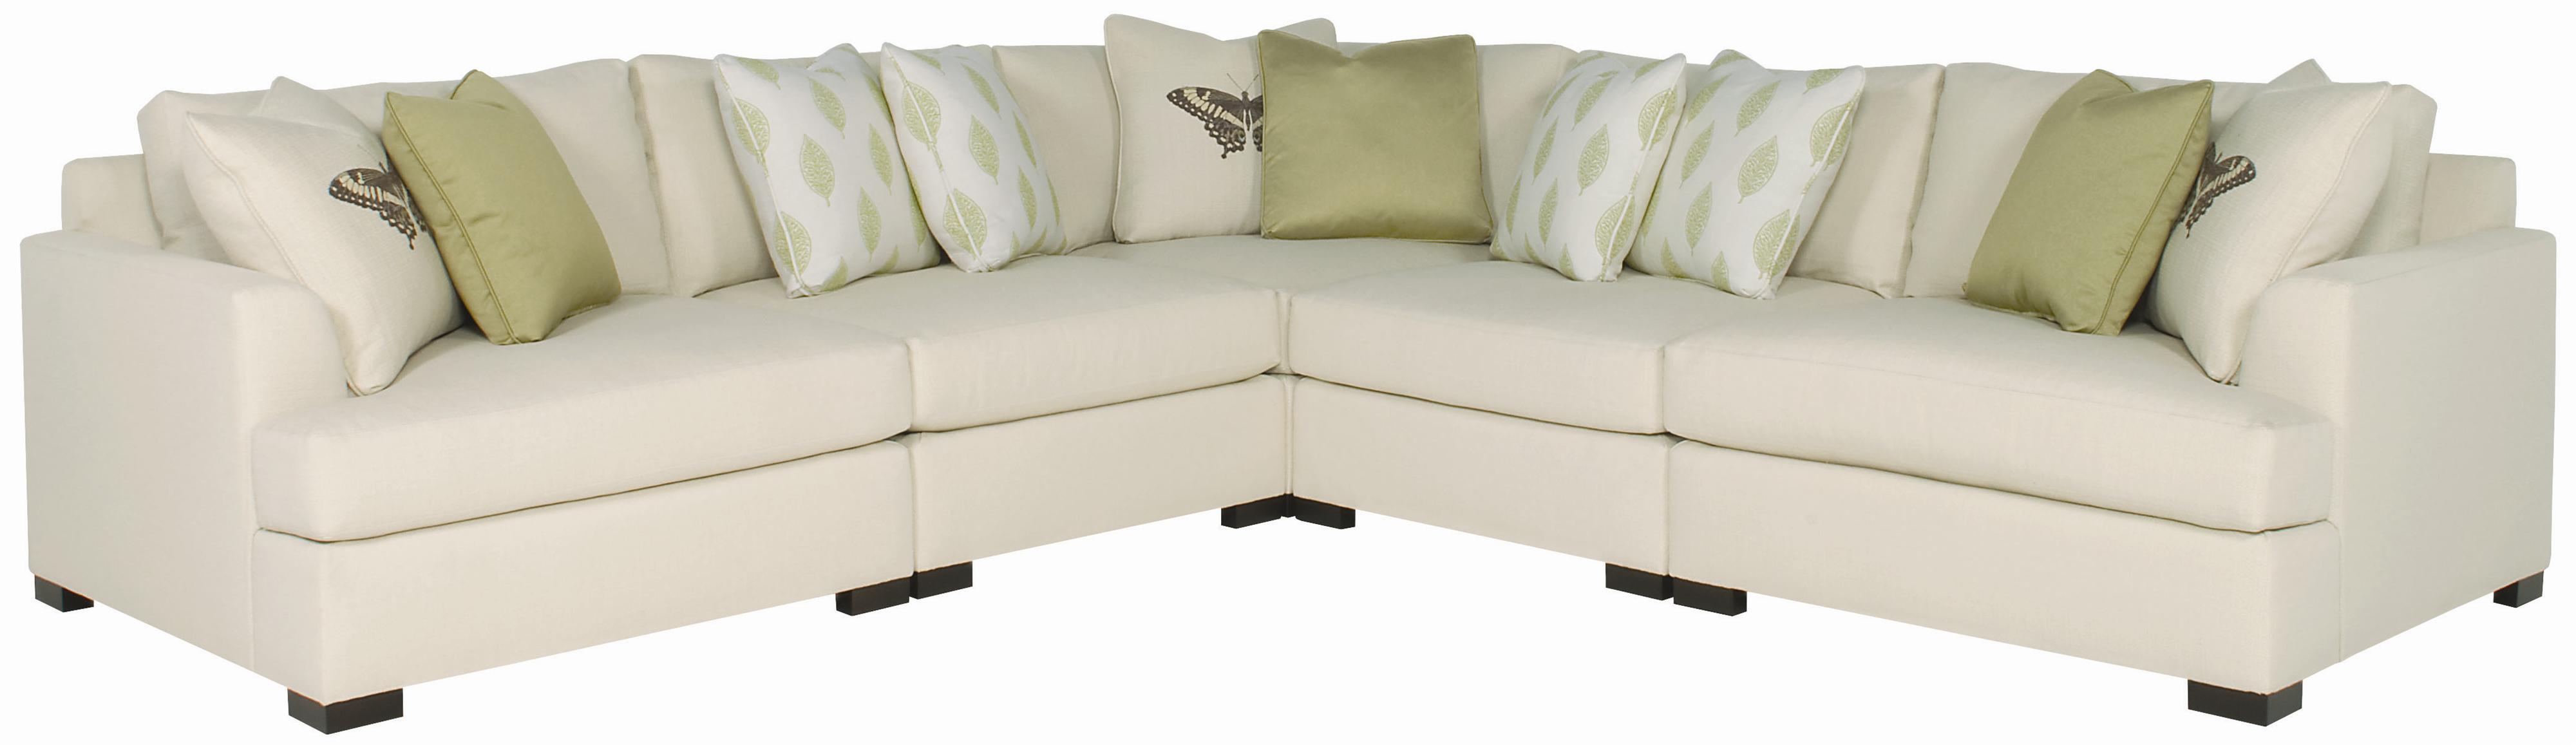 Bernhardt Adriana Sectional Sofa - Item Number: N1536+2xN1530+N1532+N1535